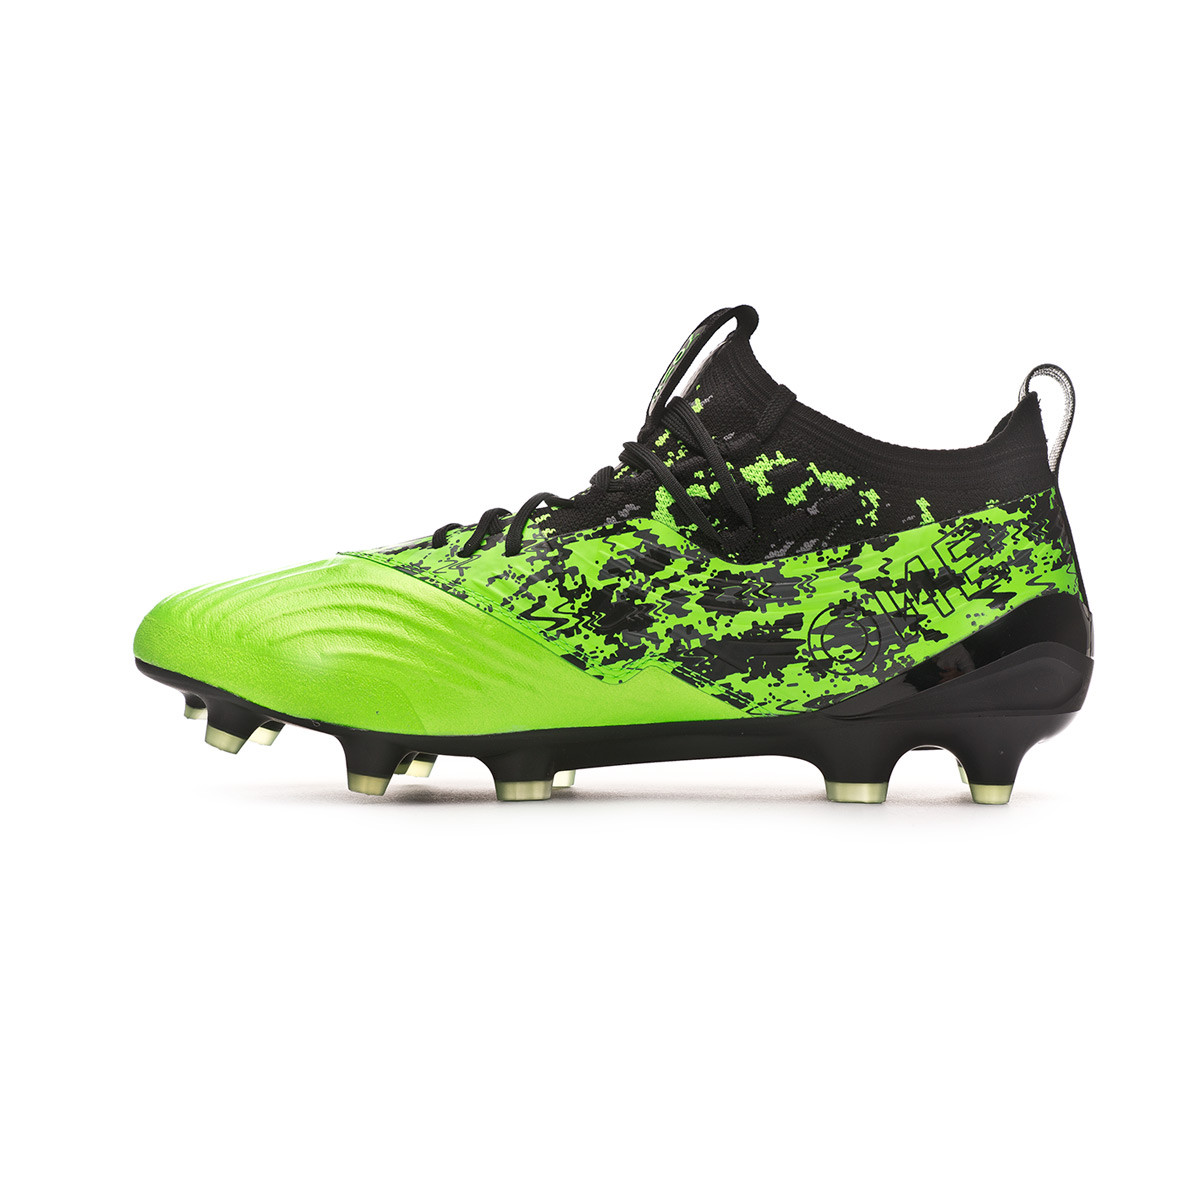 75c1c64c1 Football Boots Puma One 19.1 FG/AG Green Gecko-Puma Black-Charcoal Gray -  Football store Fútbol Emotion